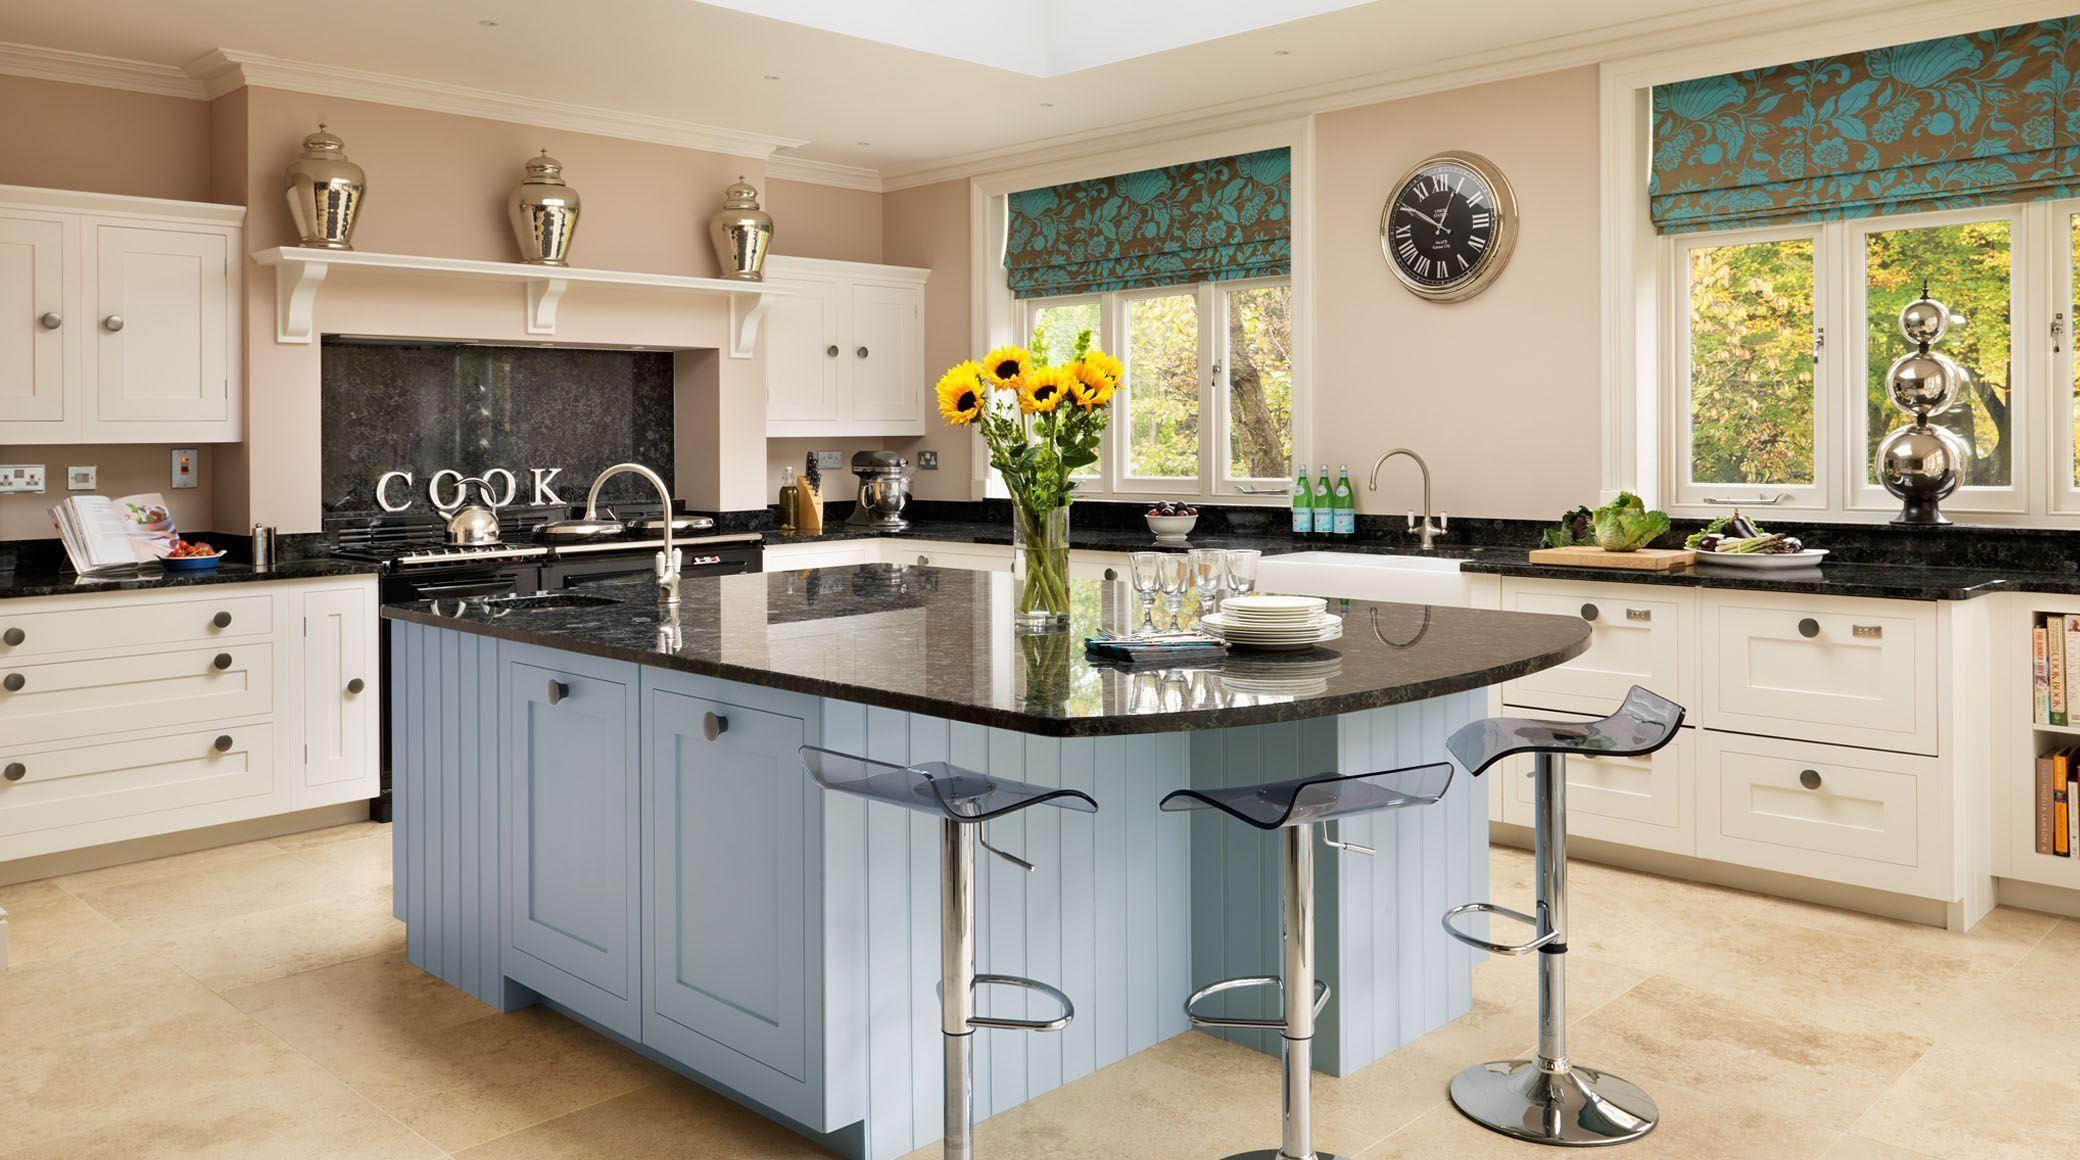 An open plan family Shaker kitchen by Harvey Jones featuring a